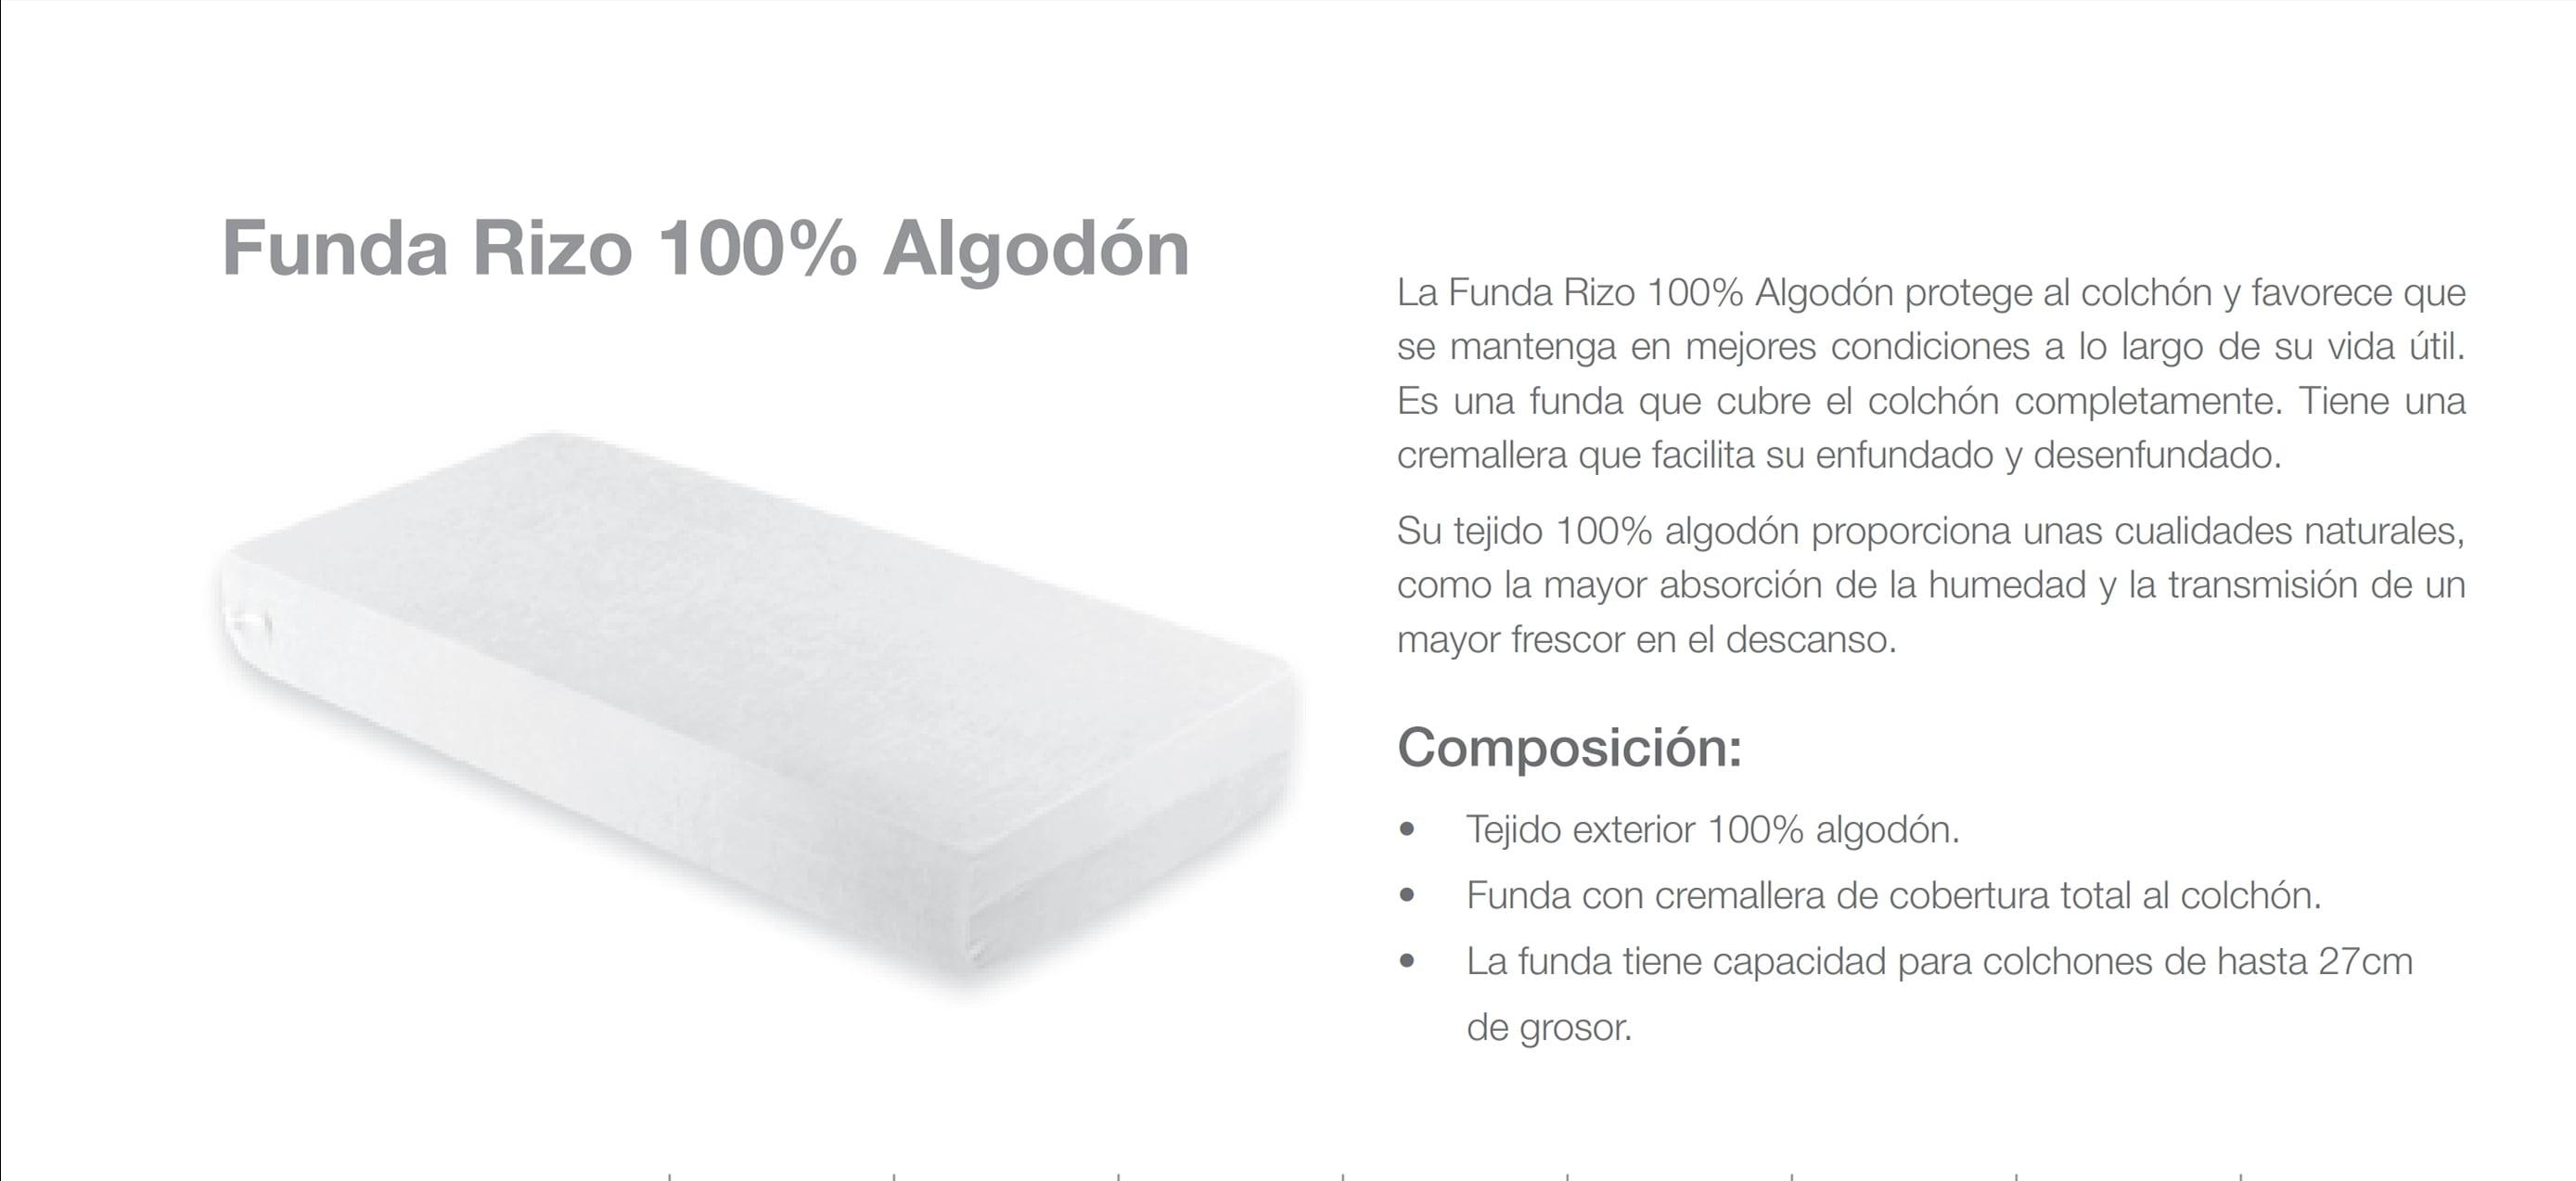 Funda Rizo 100% Algodón